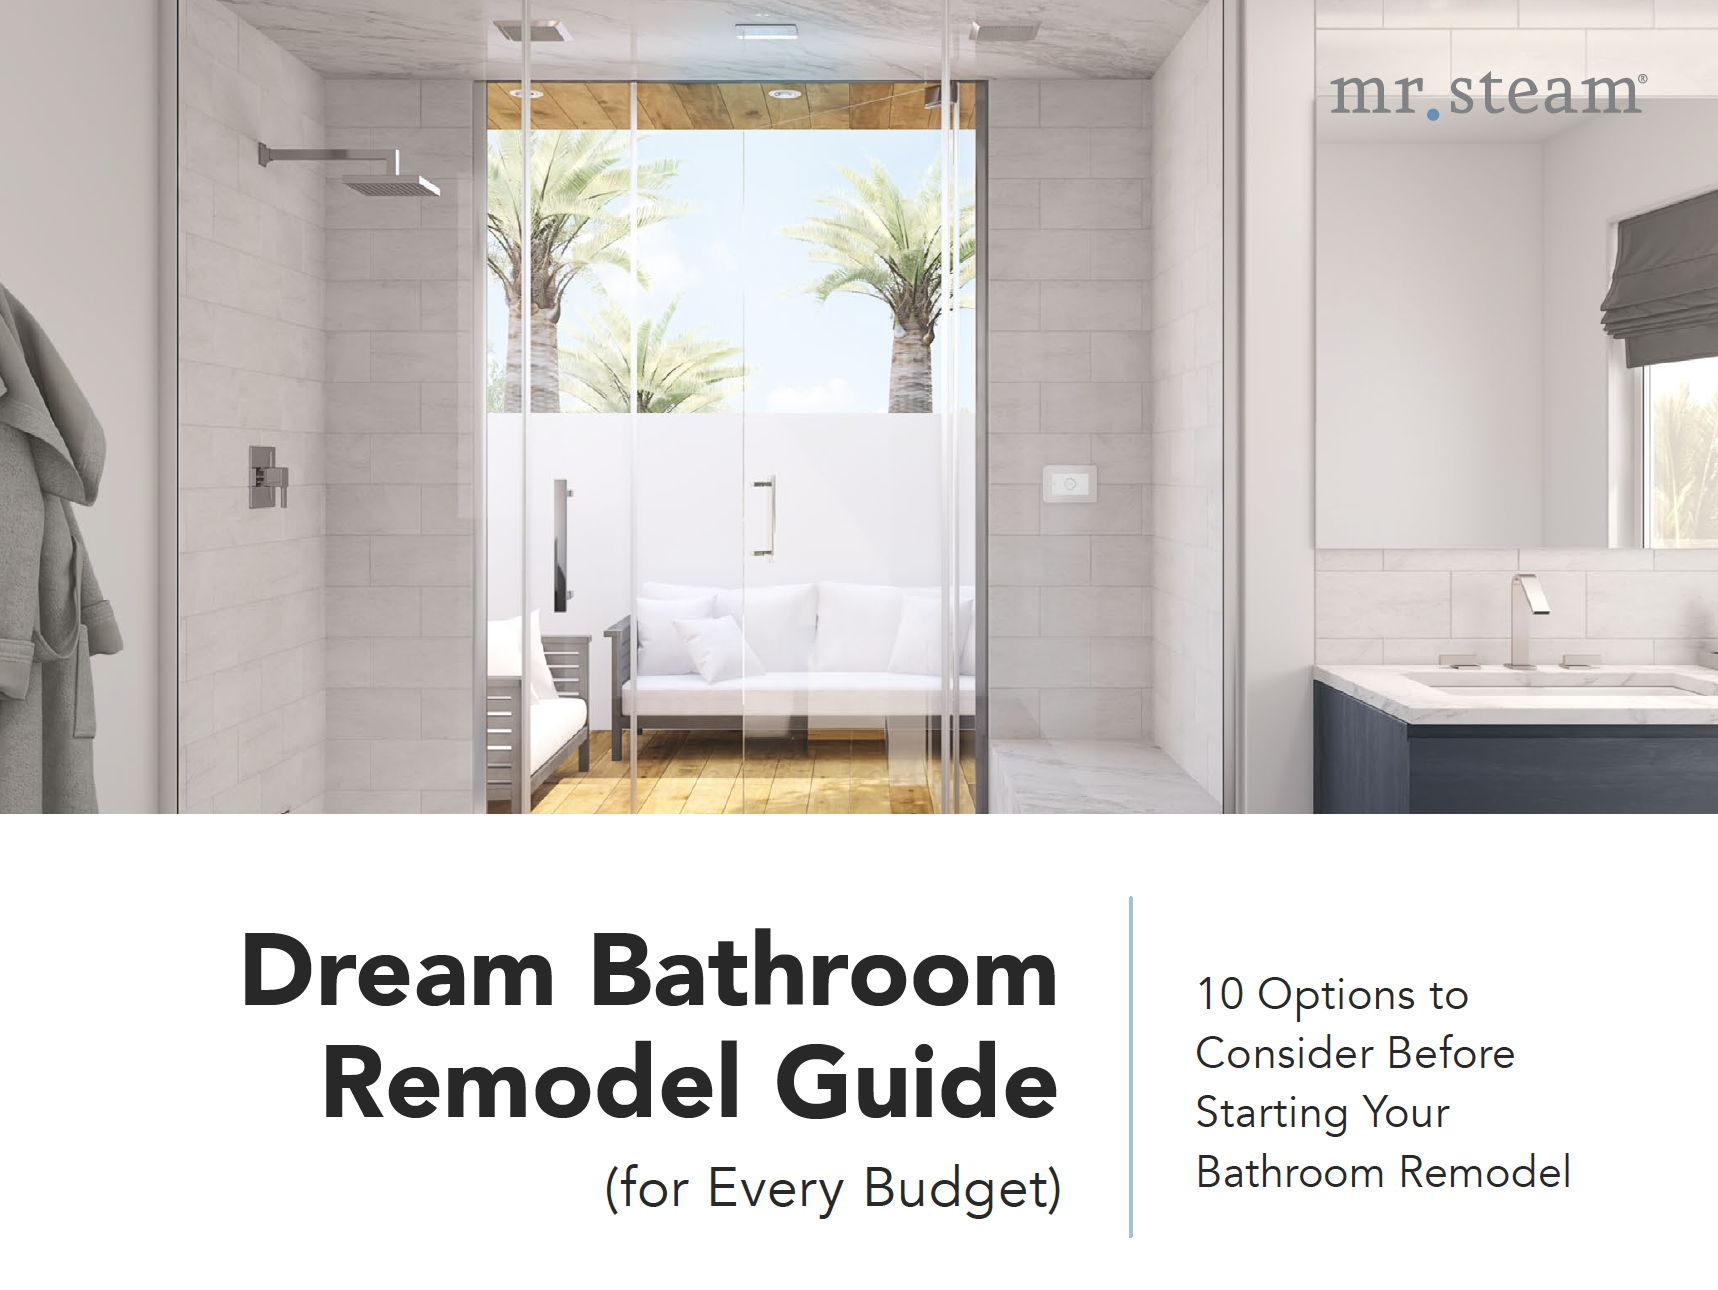 Dream Bathroom Remodel Guide